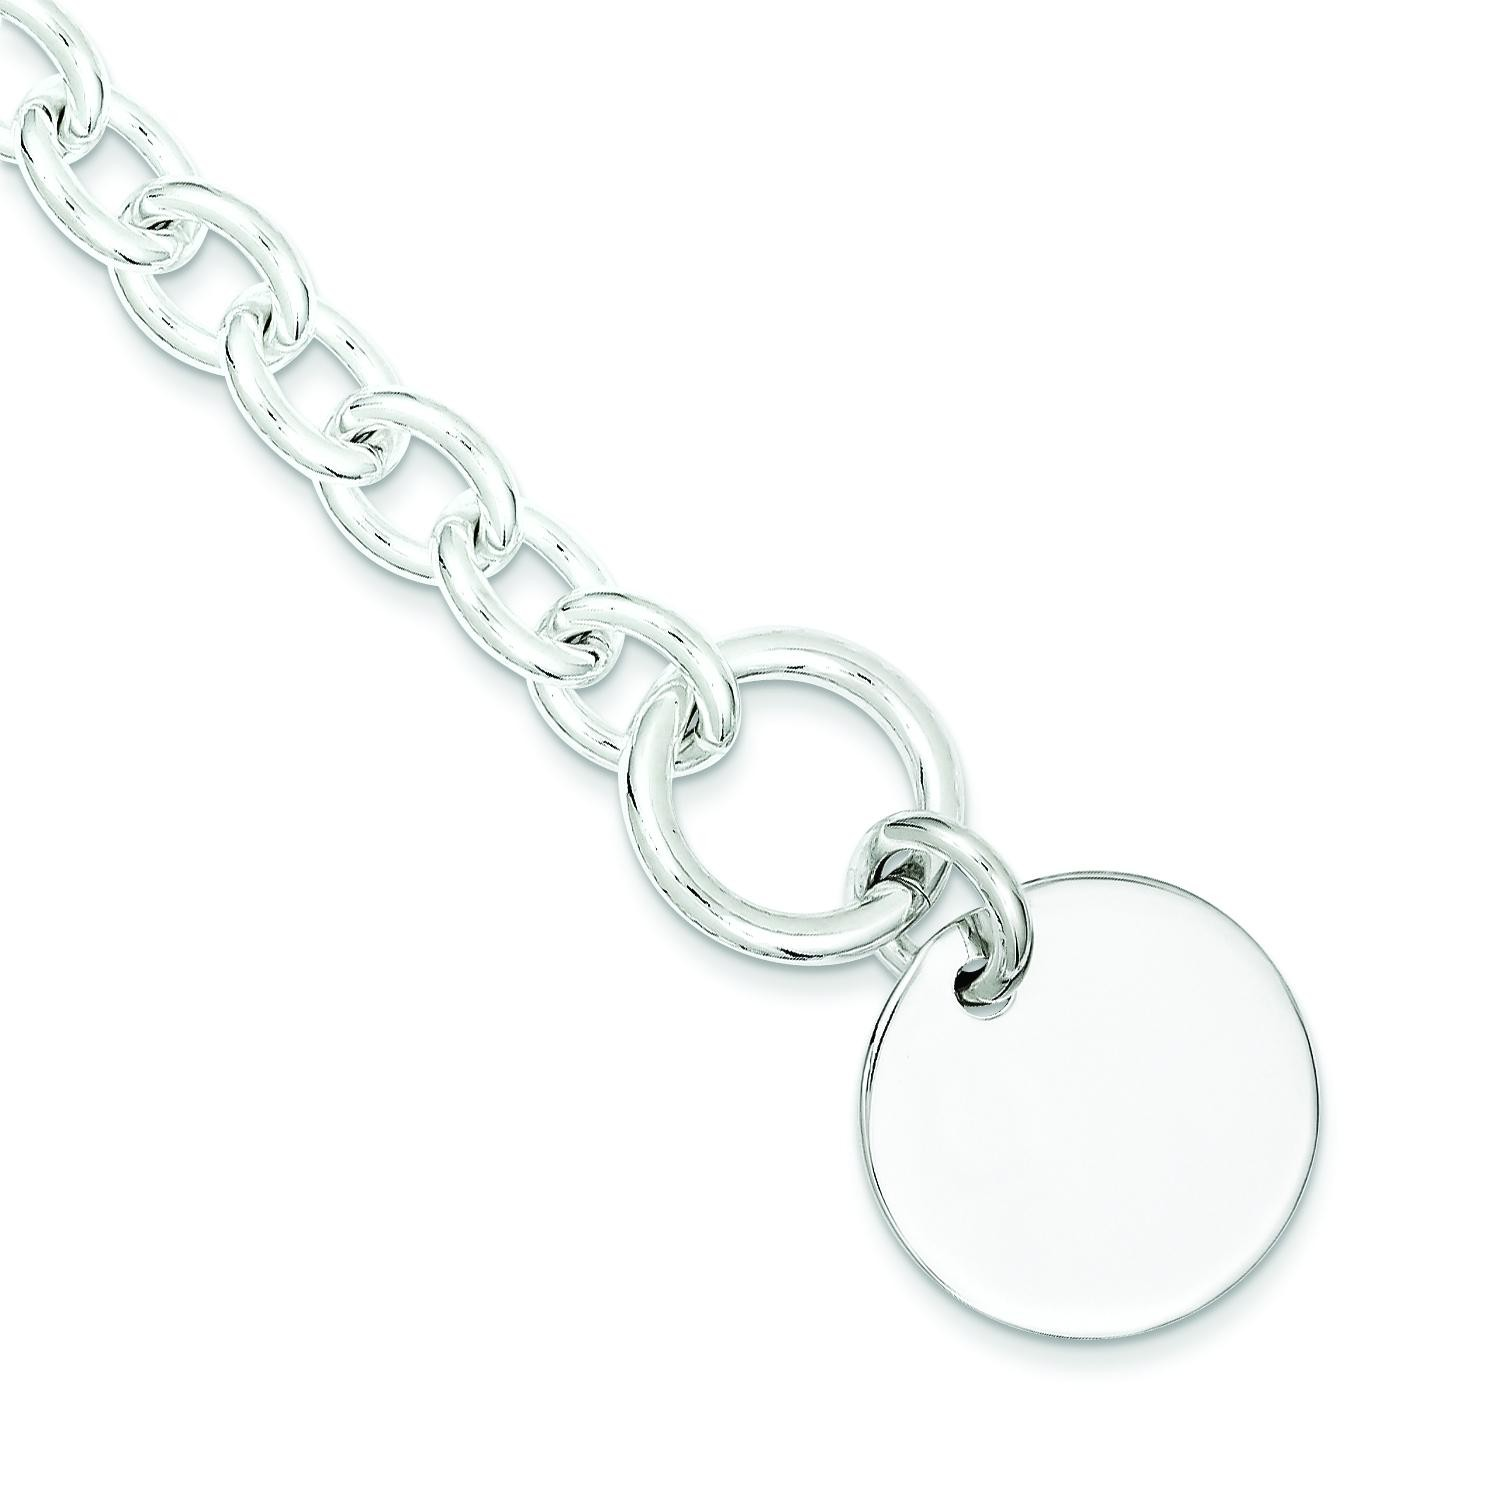 Circular Disc Link Bracelet in Sterling Silver